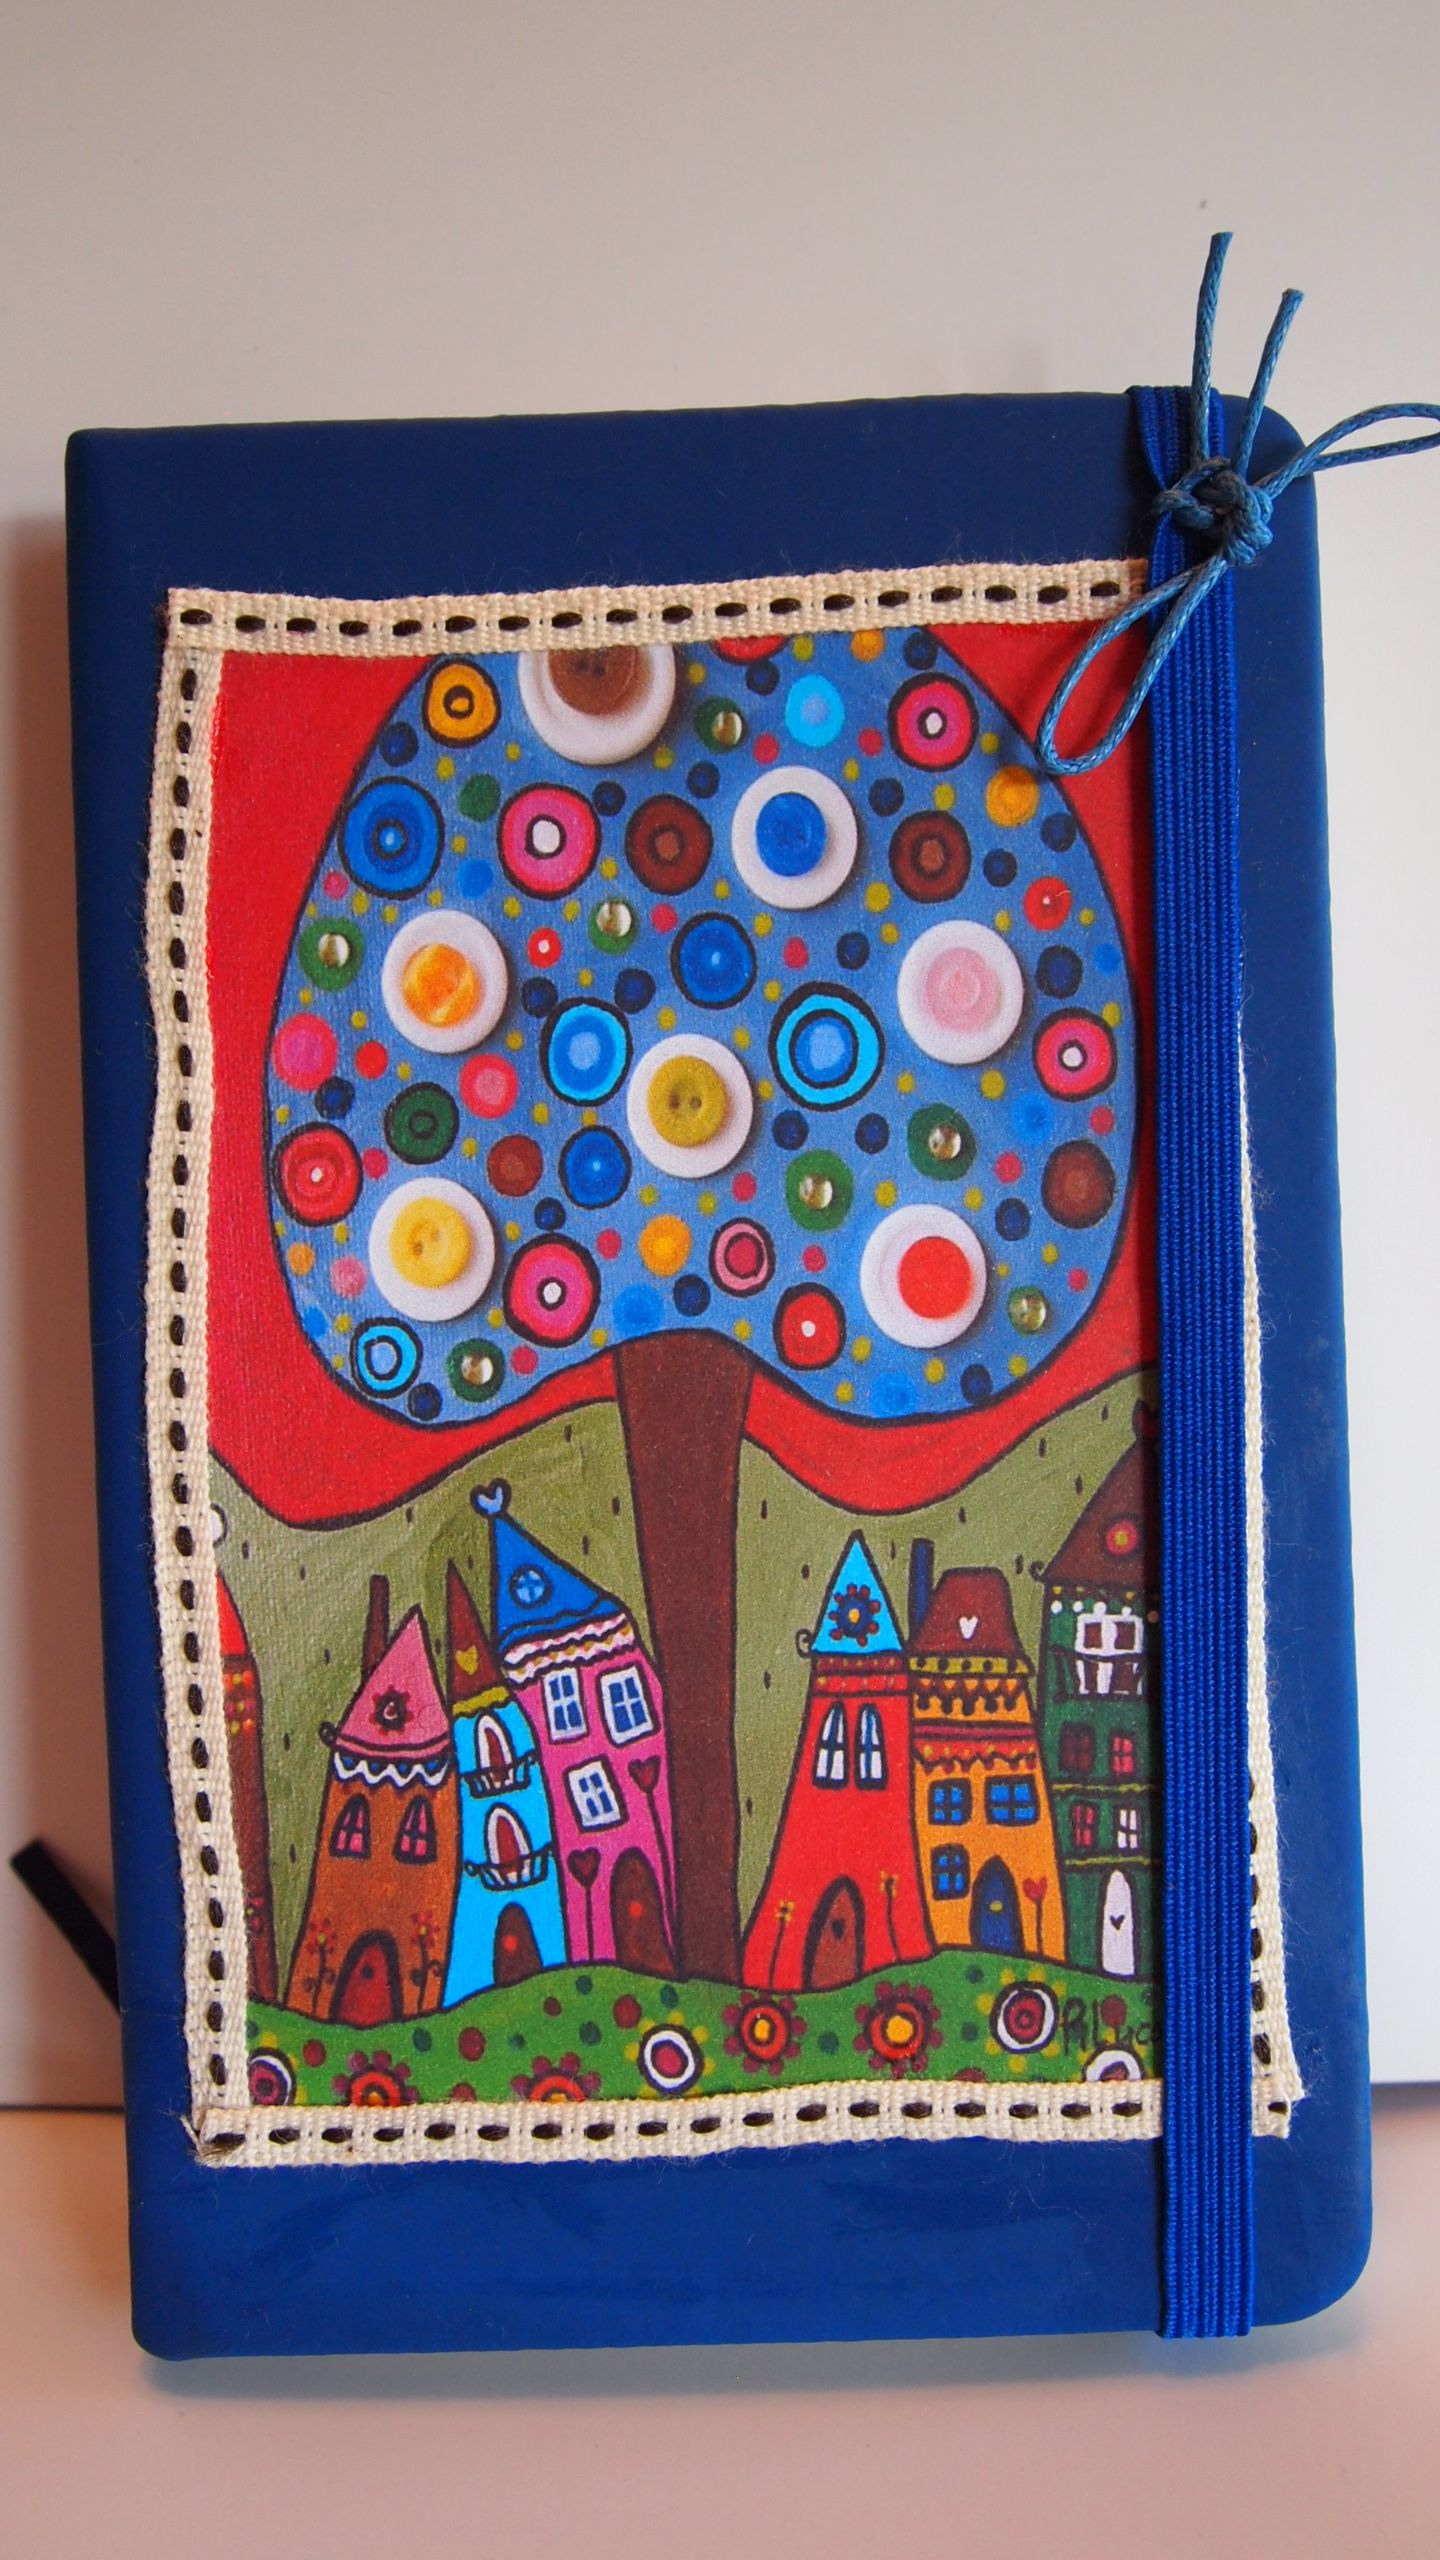 Libretas decoradas con mis dibujos naif. | domy | Pinterest ...